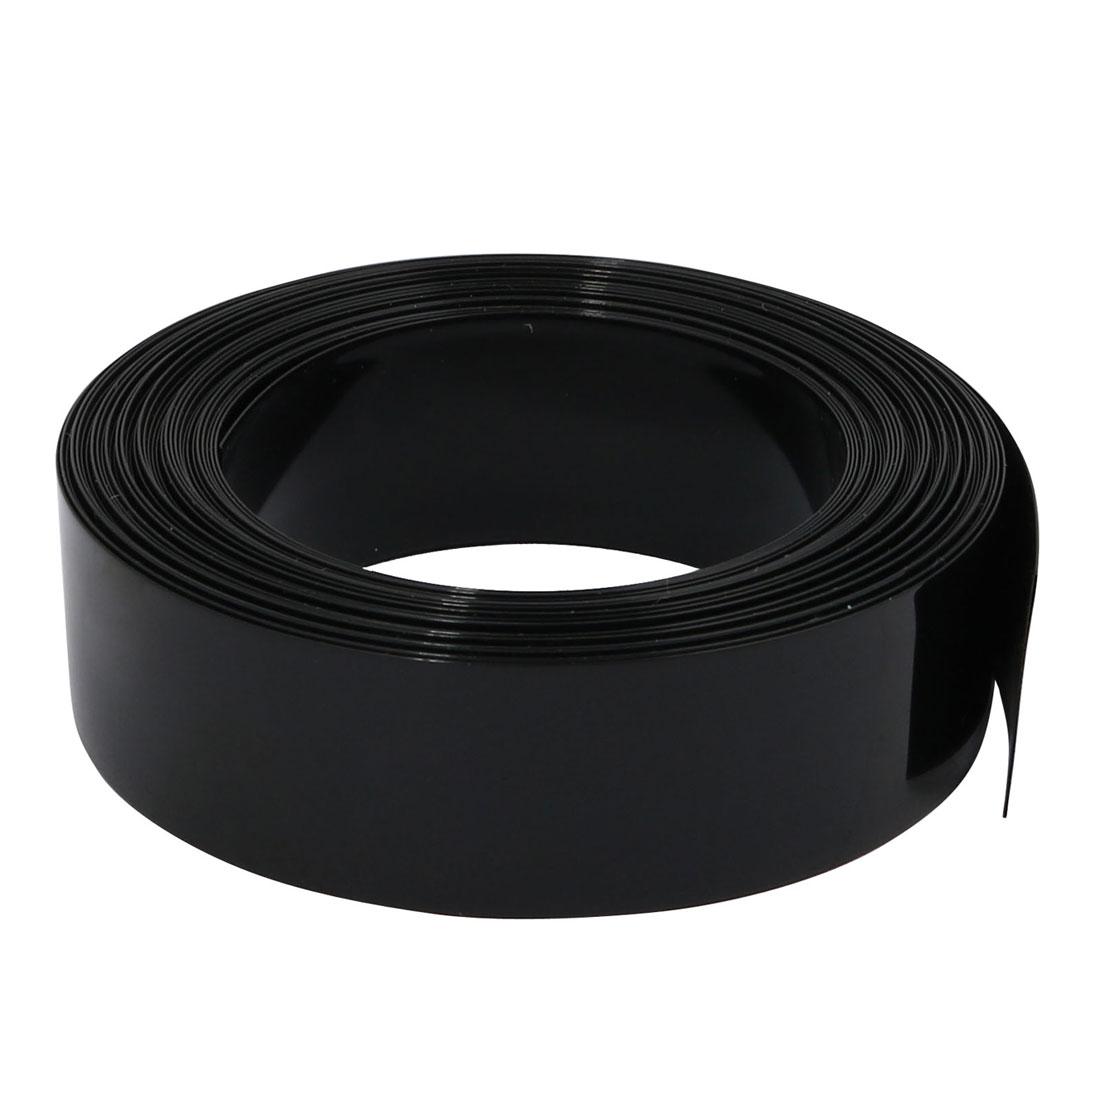 18.5mm Flat Width 6M Long PVC Heat Shrinkable Tube Black for Capacitive Battery